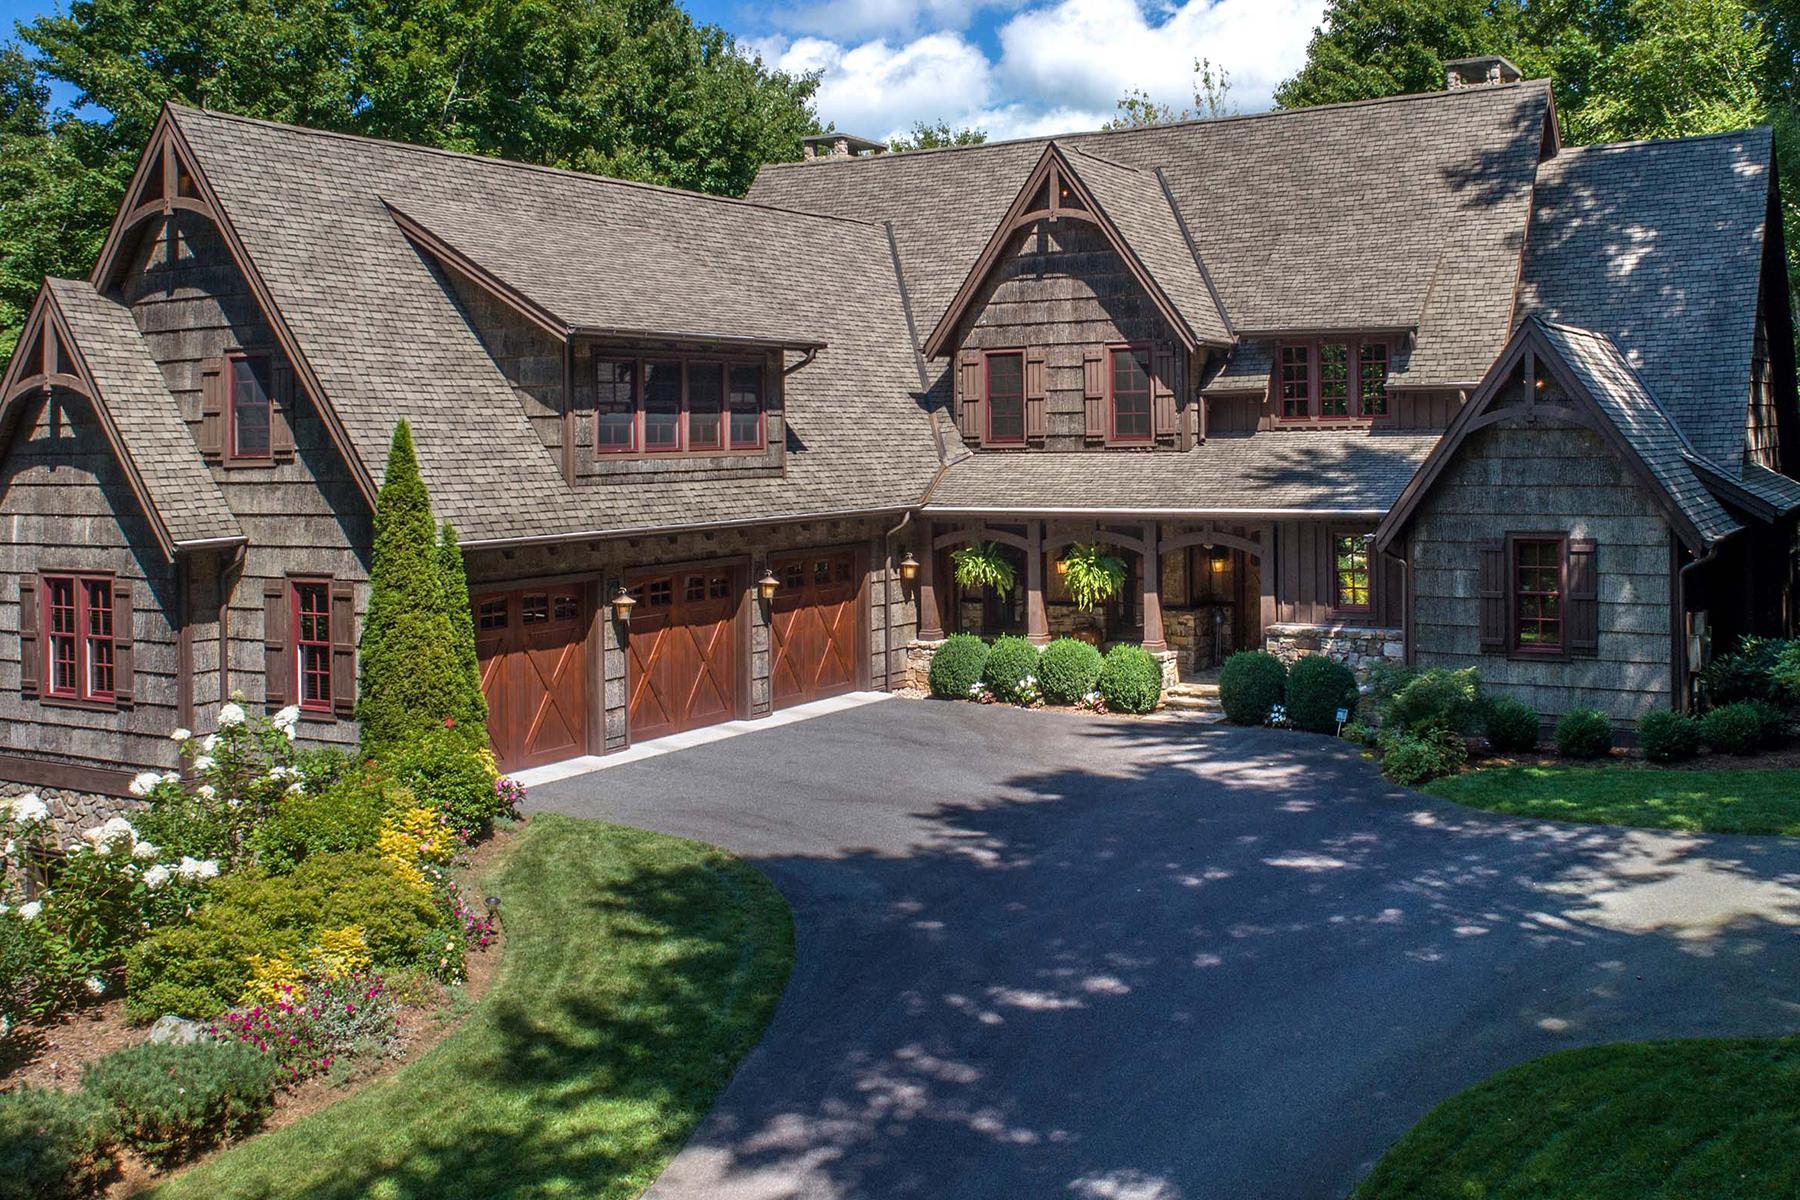 Single Family Homes for Sale at BANNER ELK - THE GLENS OF GRANDFATHER 337 The Glens Blvd Banner Elk, North Carolina 28604 United States